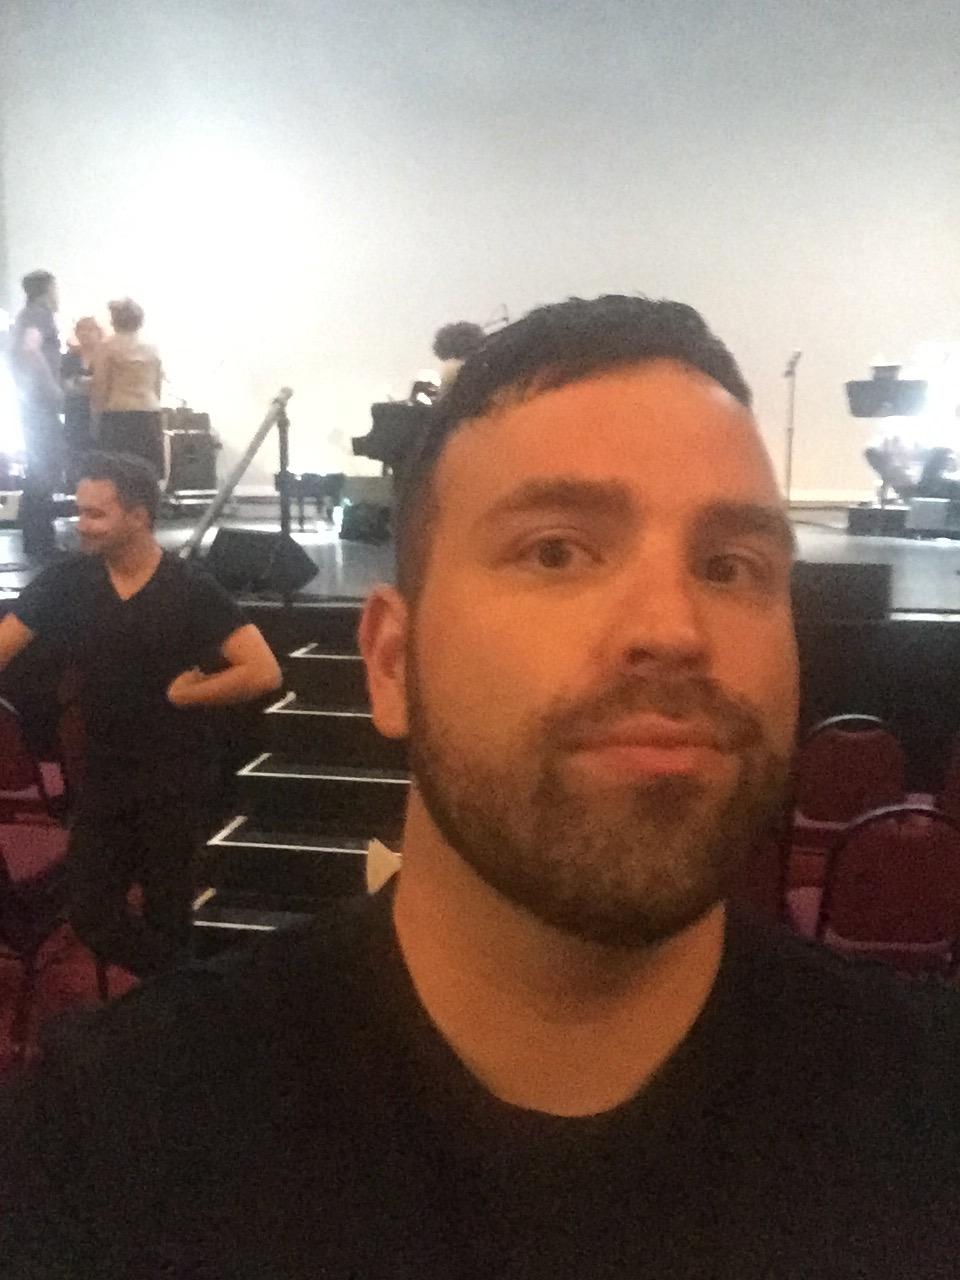 post rehearsal selfie